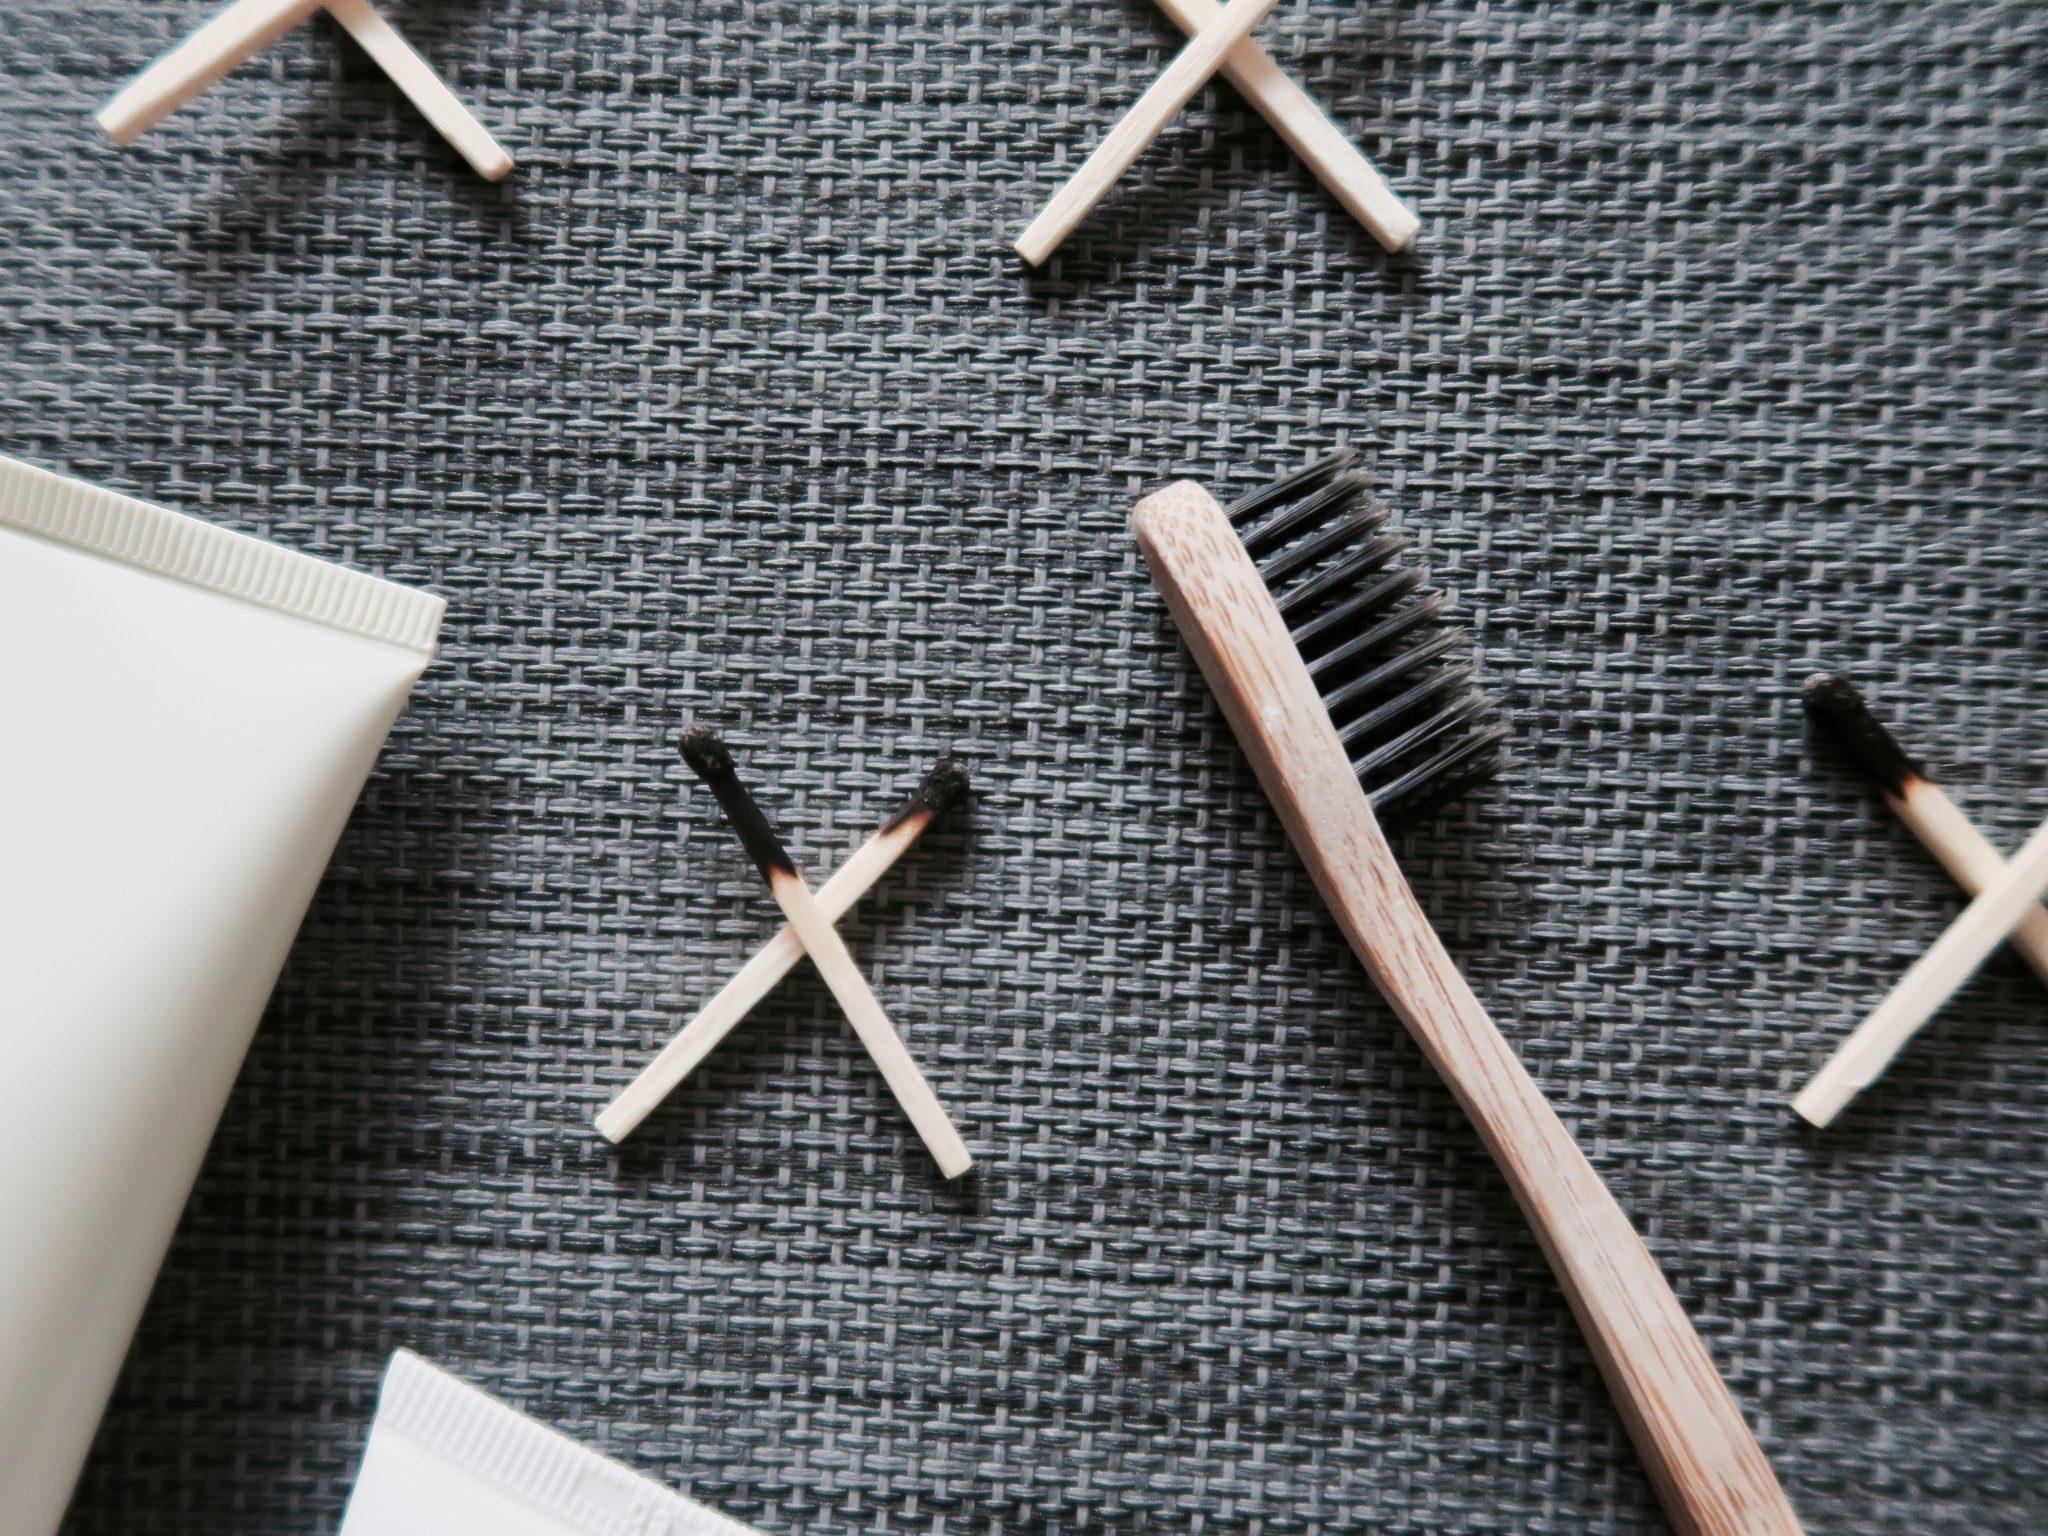 Pearlbar Toothbrush review